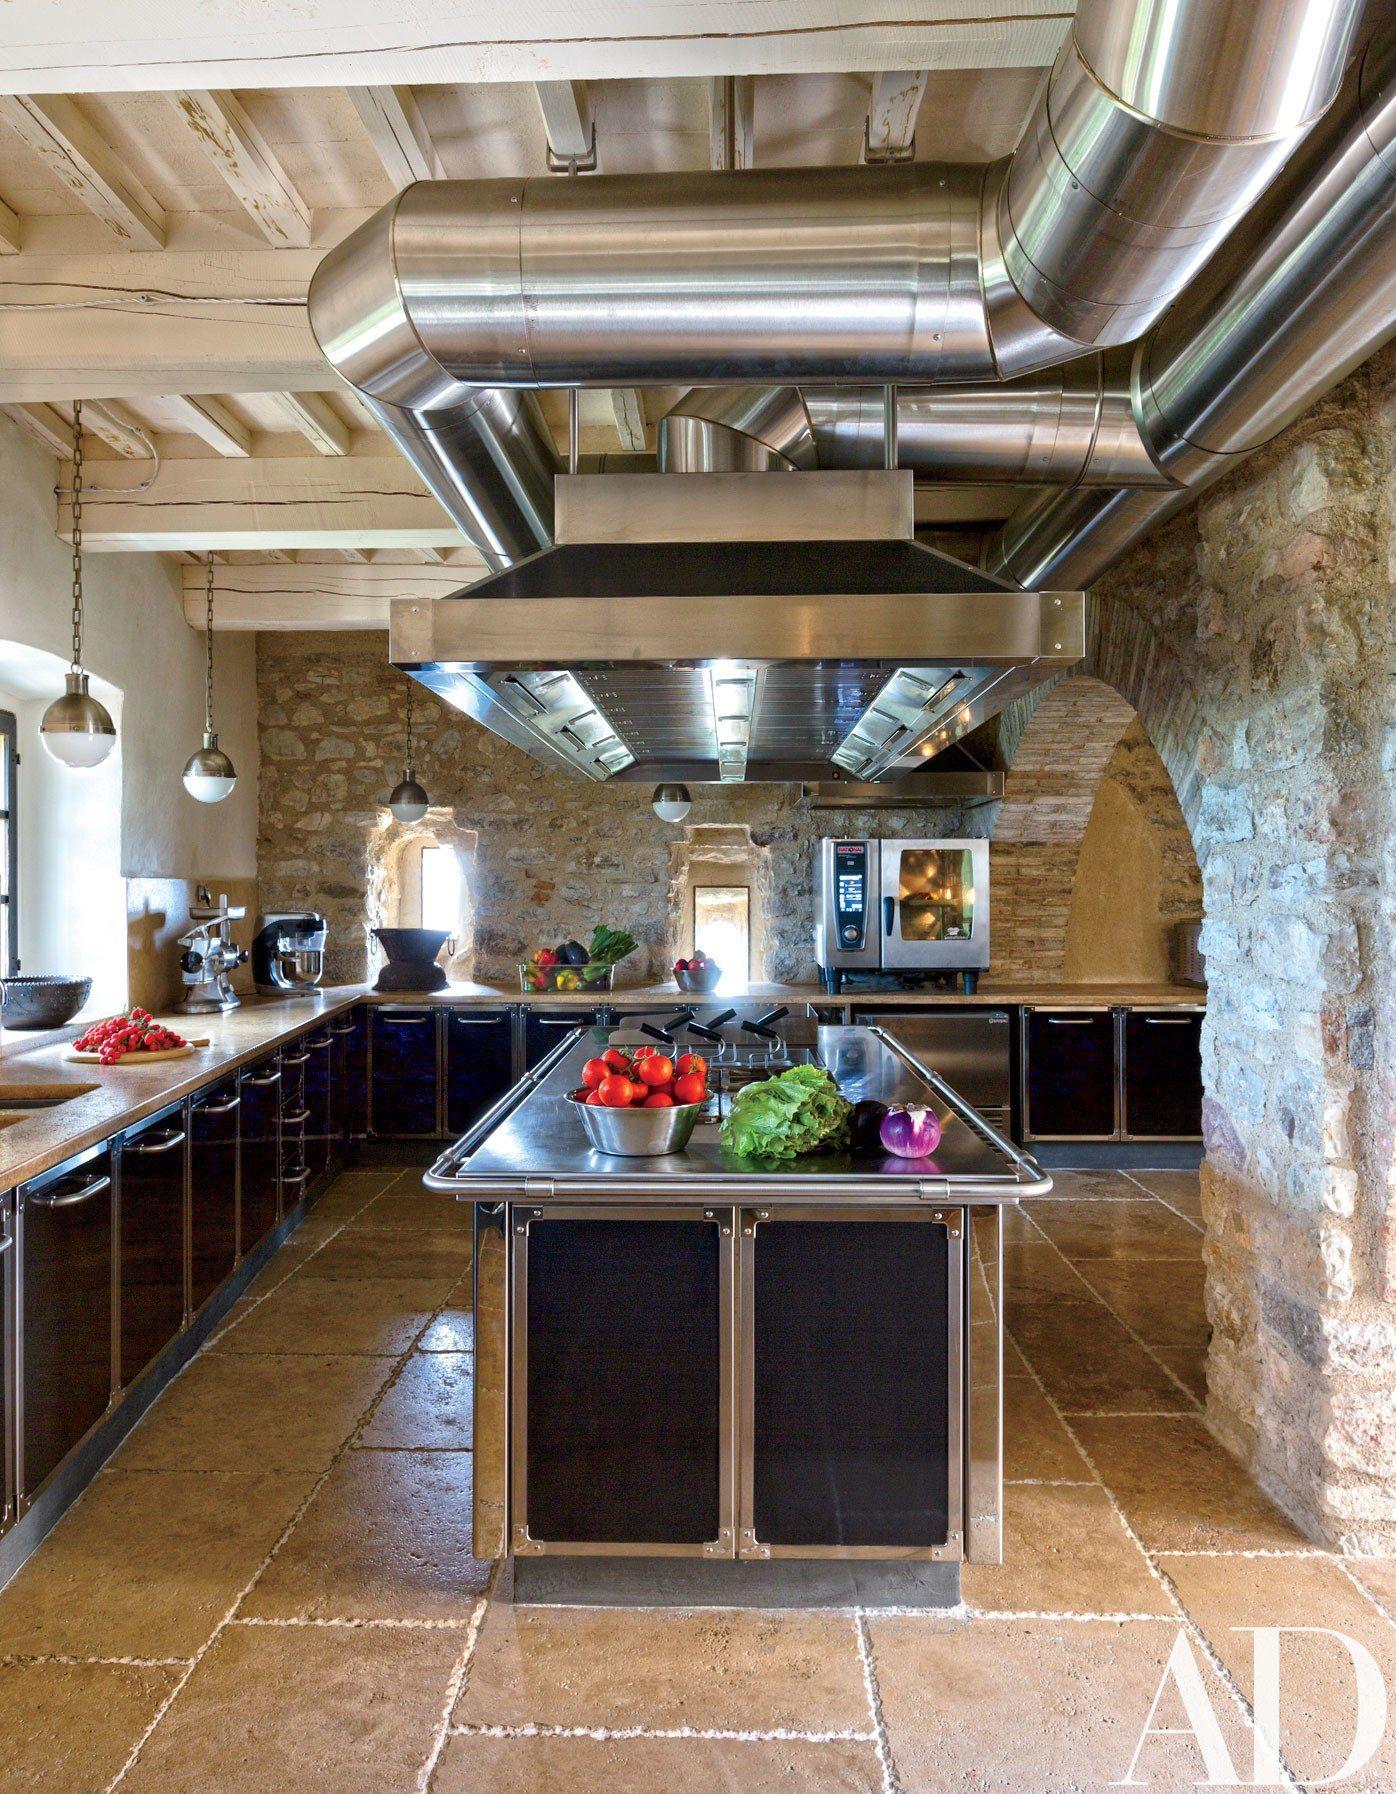 29 rustic kitchen ideas you ll want to copy kitchen inspiration rh pinterest com